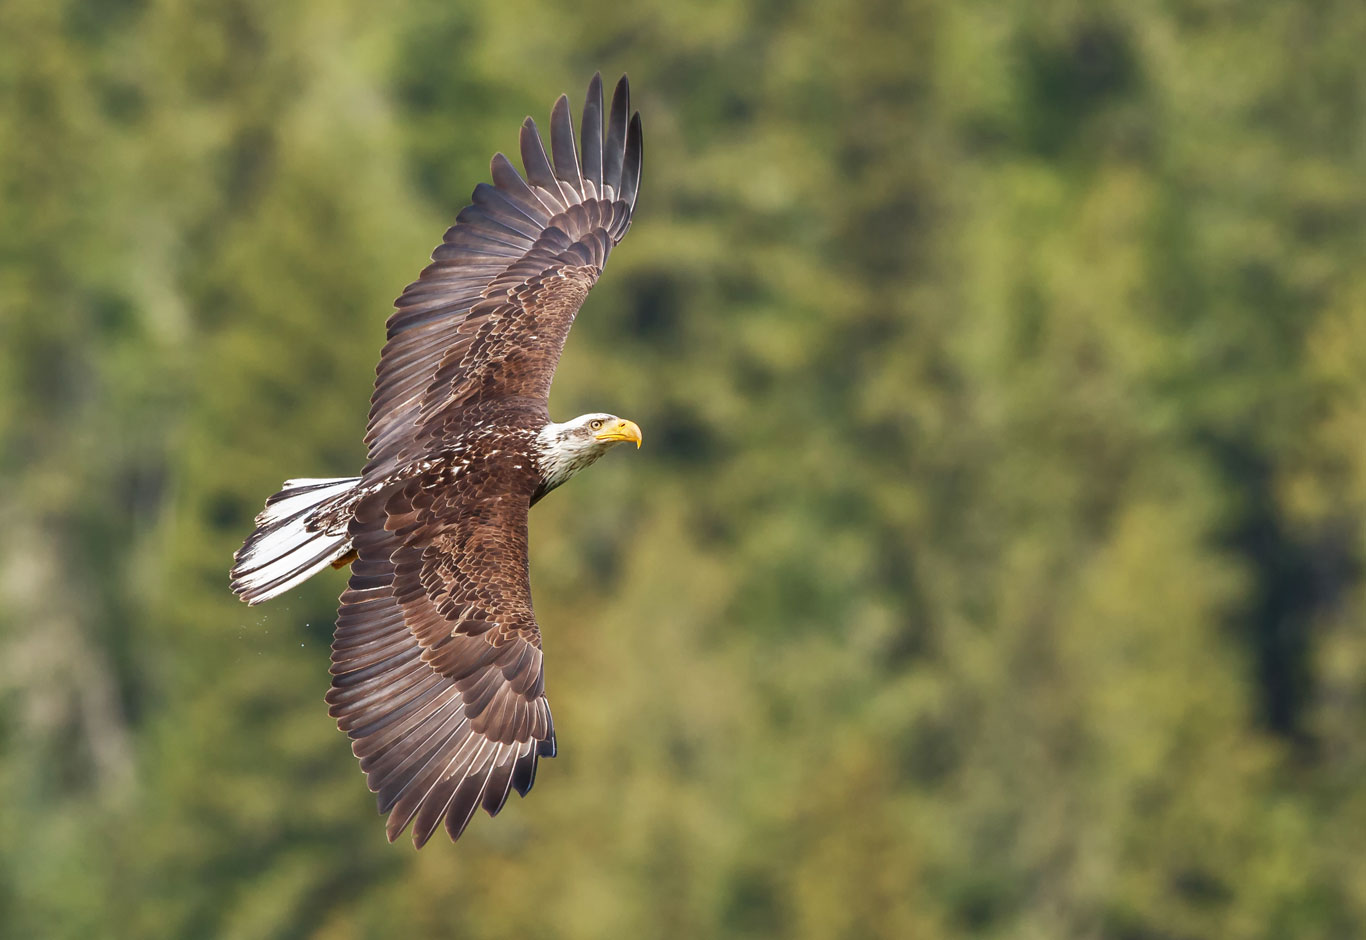 Camping-eagle-1366-0618